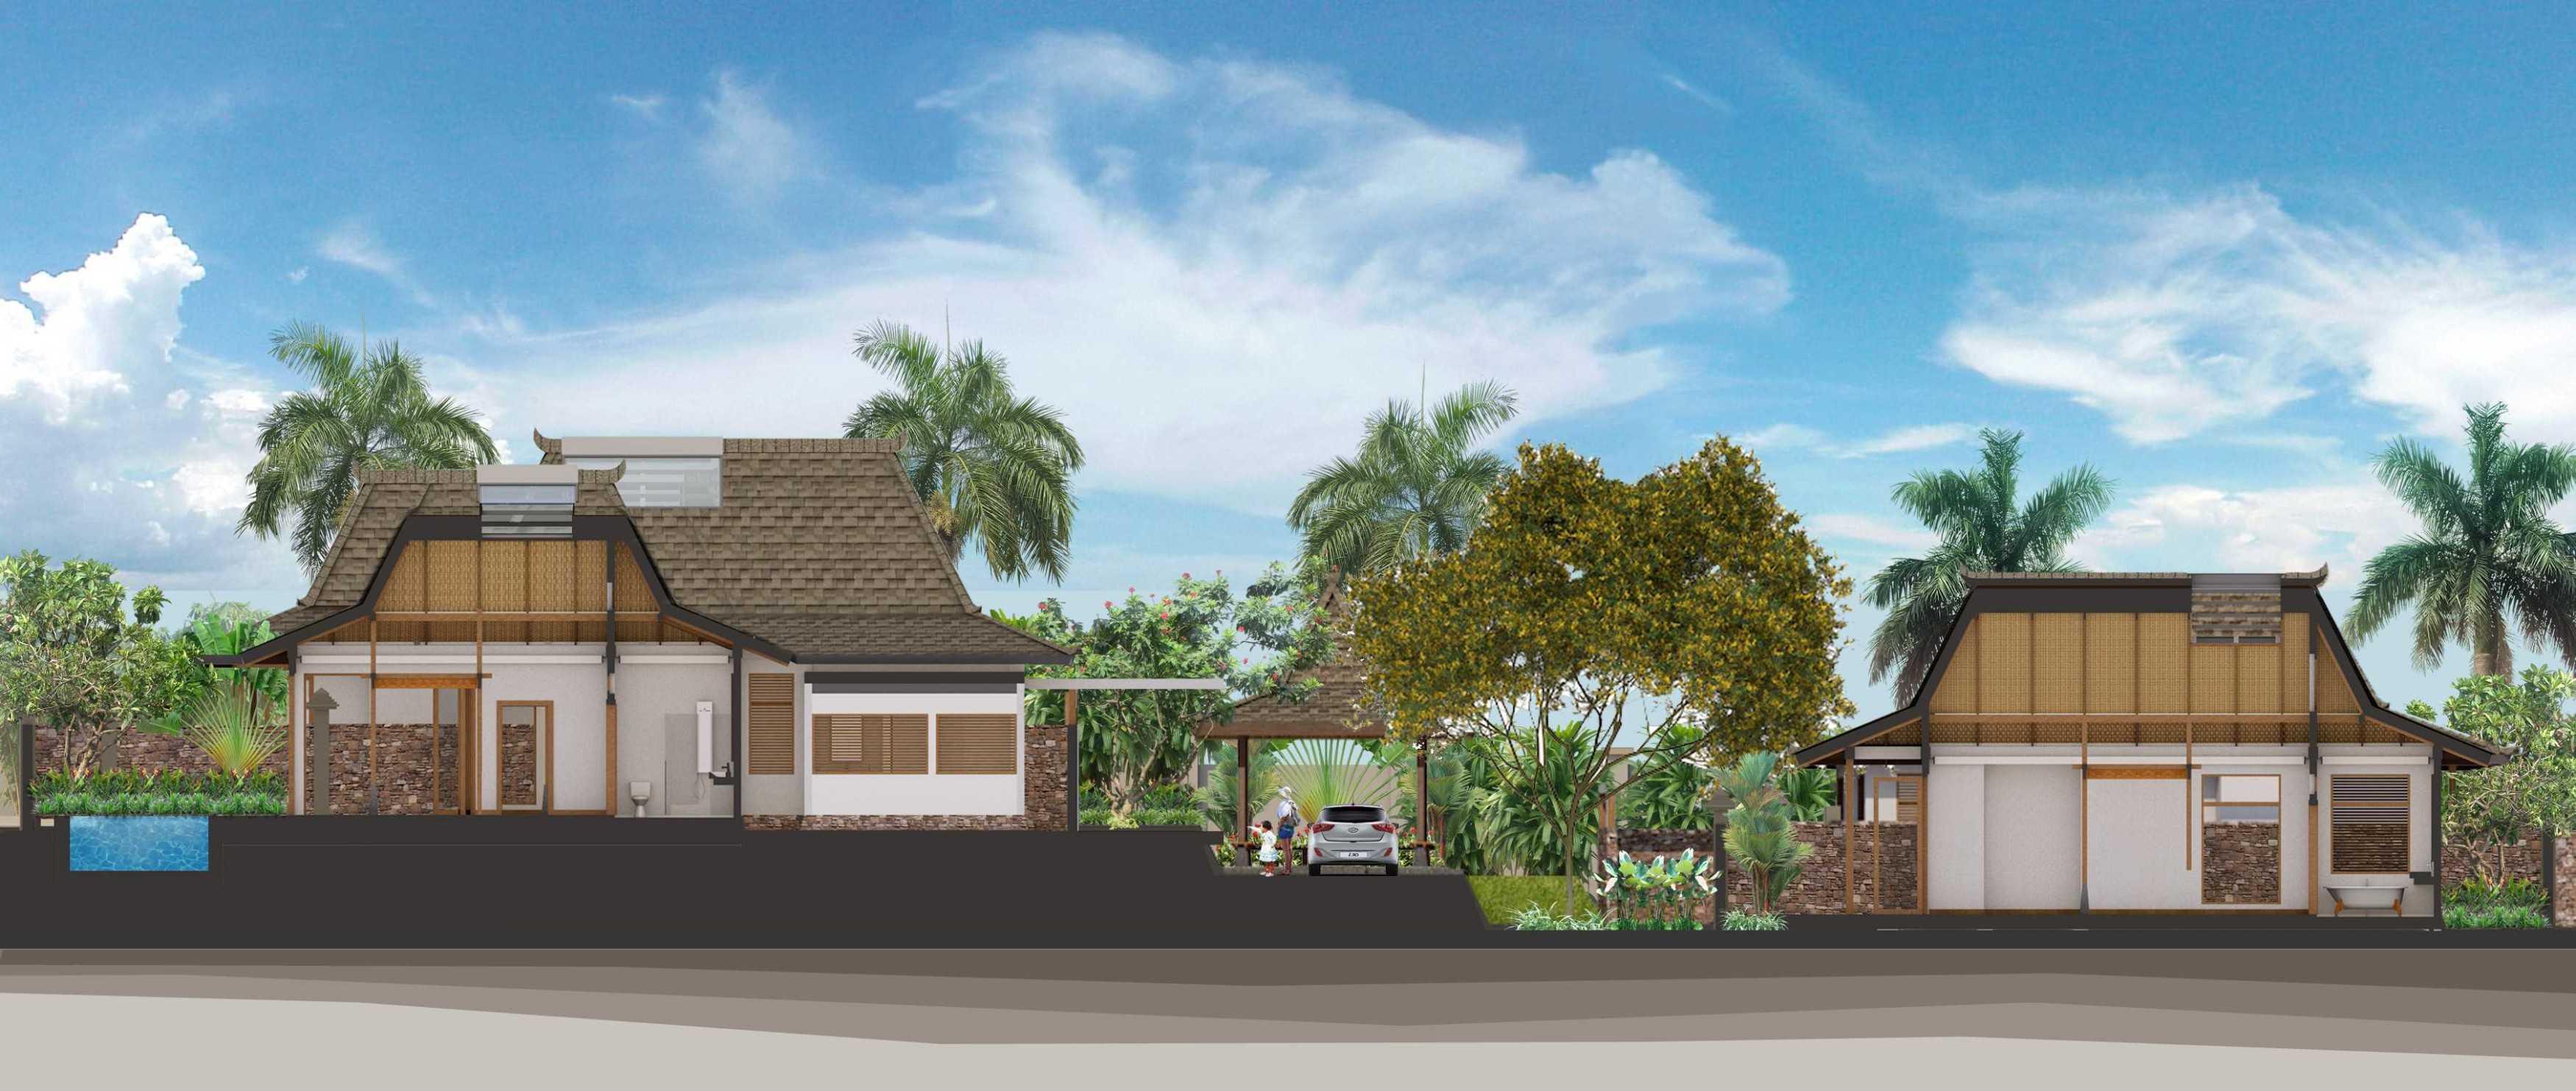 Mta Singhasari Resort Malang, East Java Malang, East Java Master Plan Section   8783